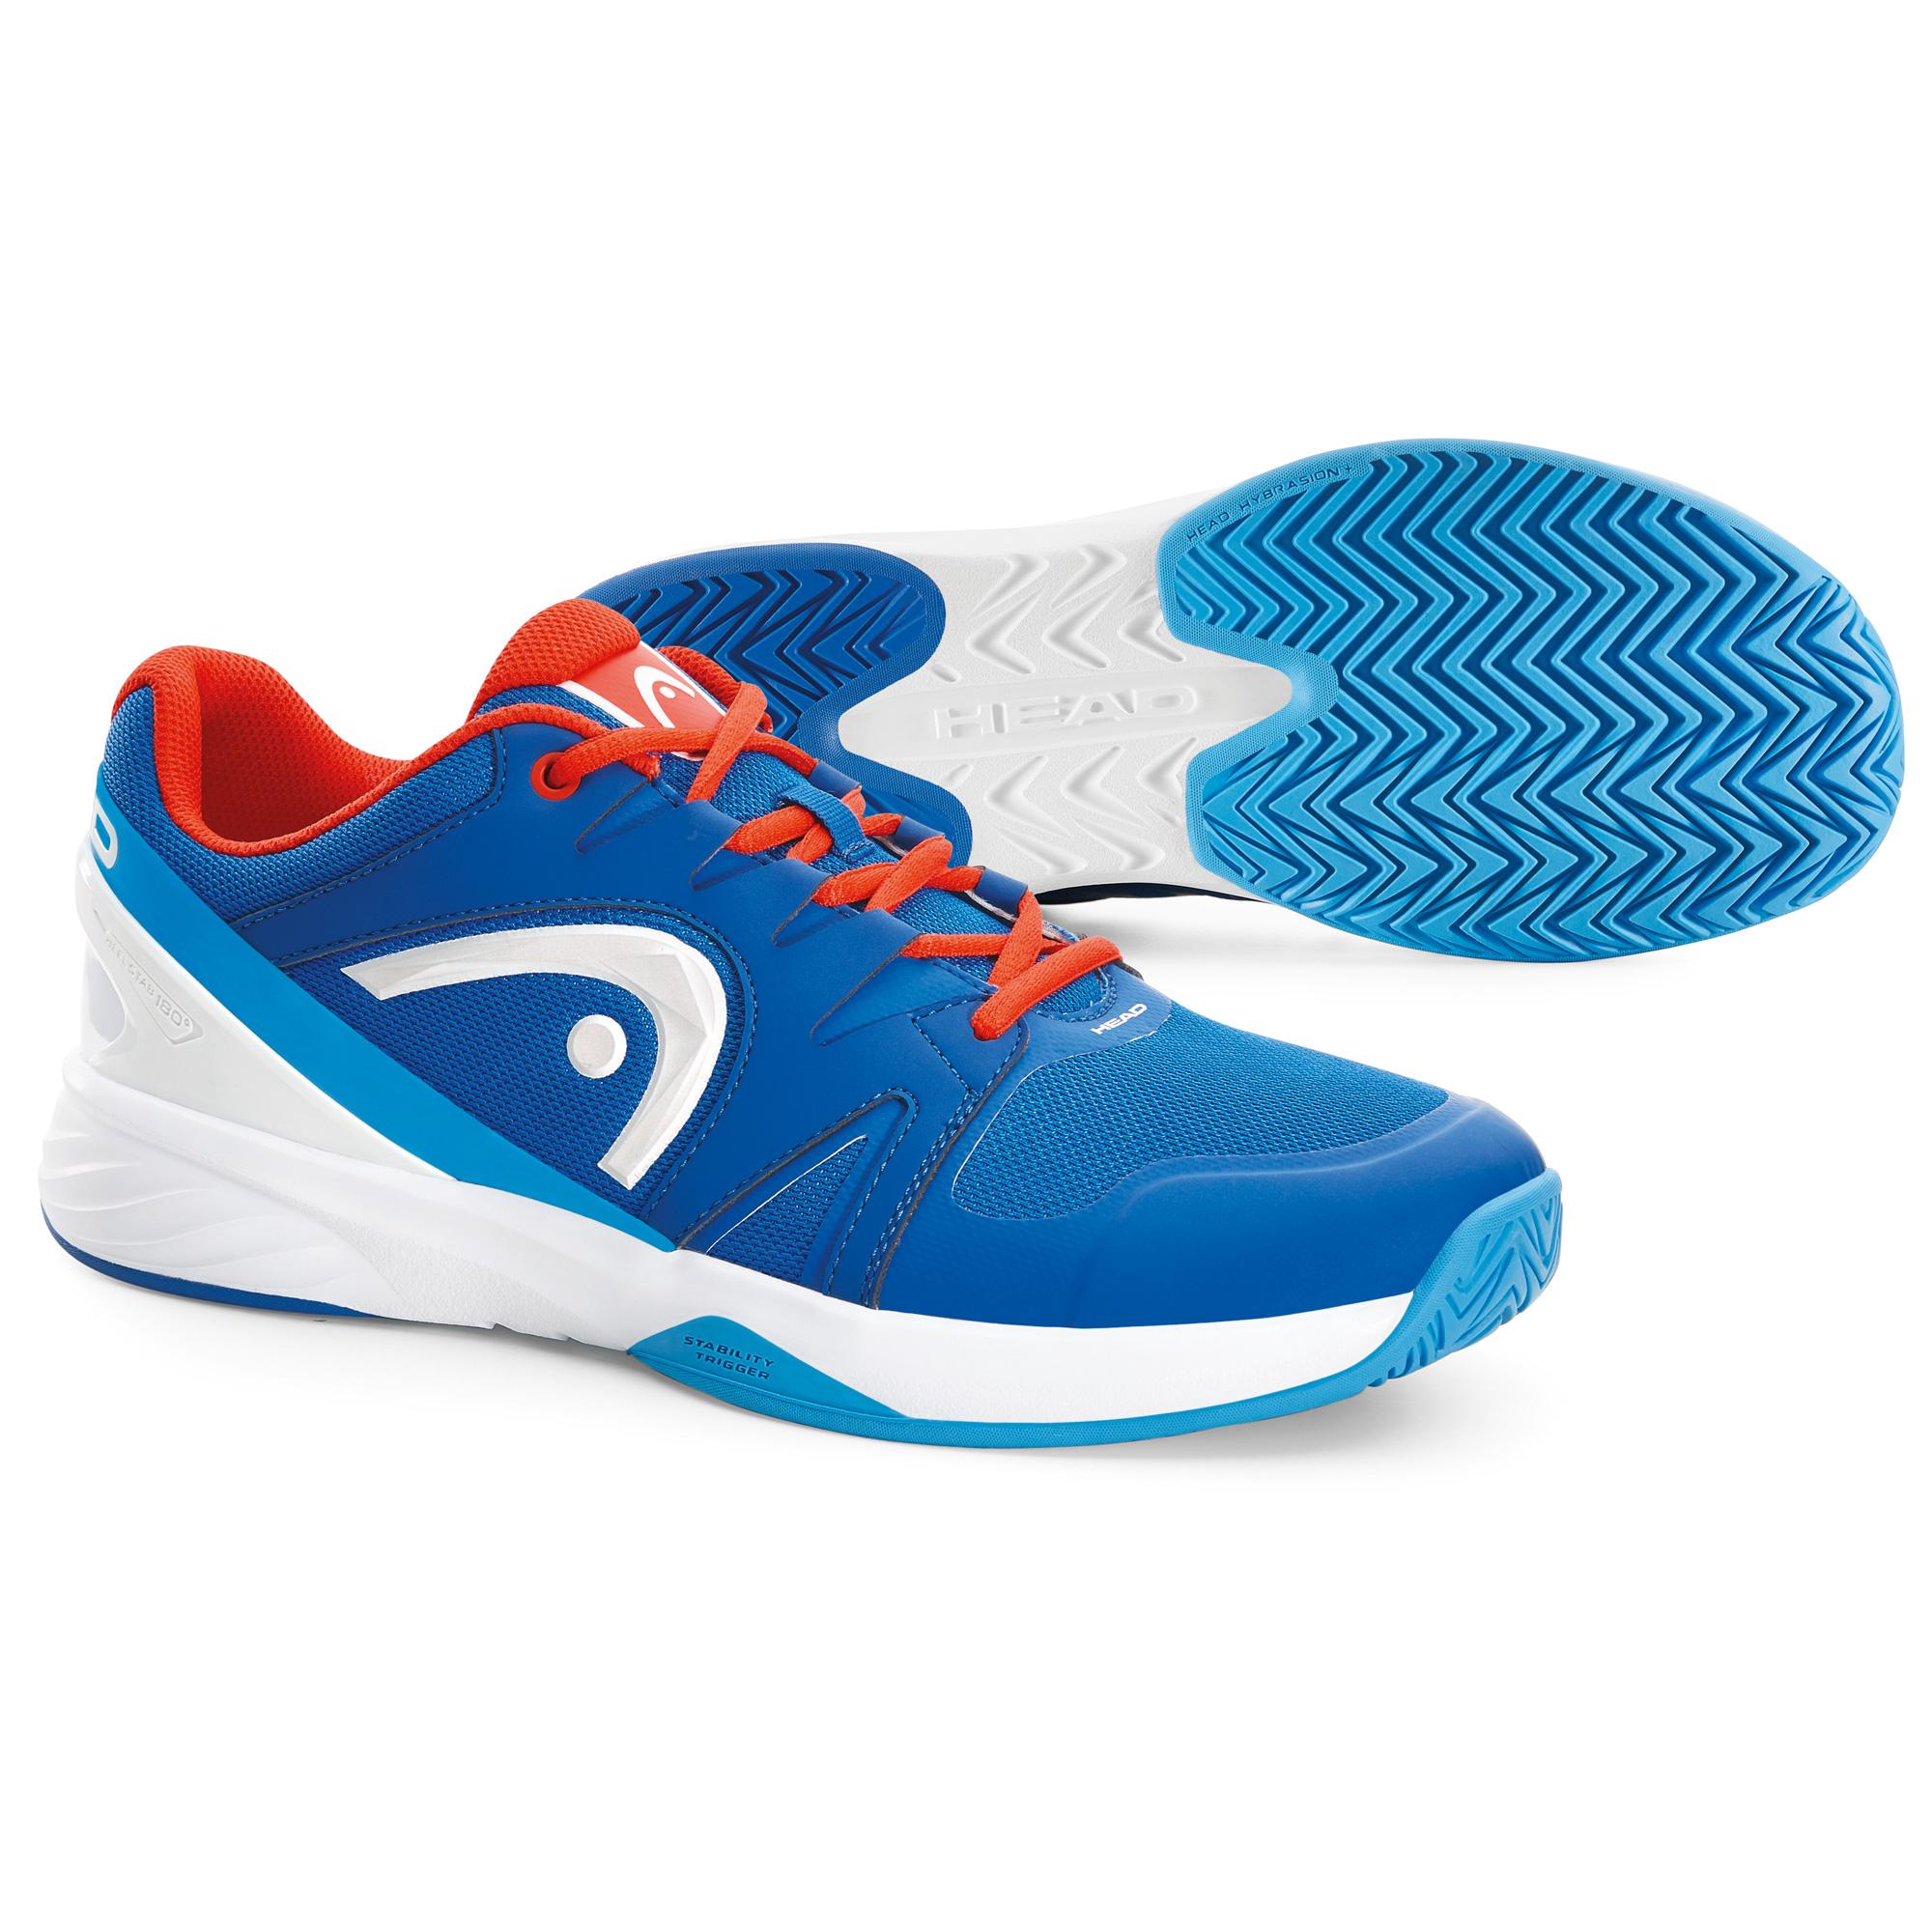 Head Nitro Team Mens Tennis Shoes SS16  9.5 UK